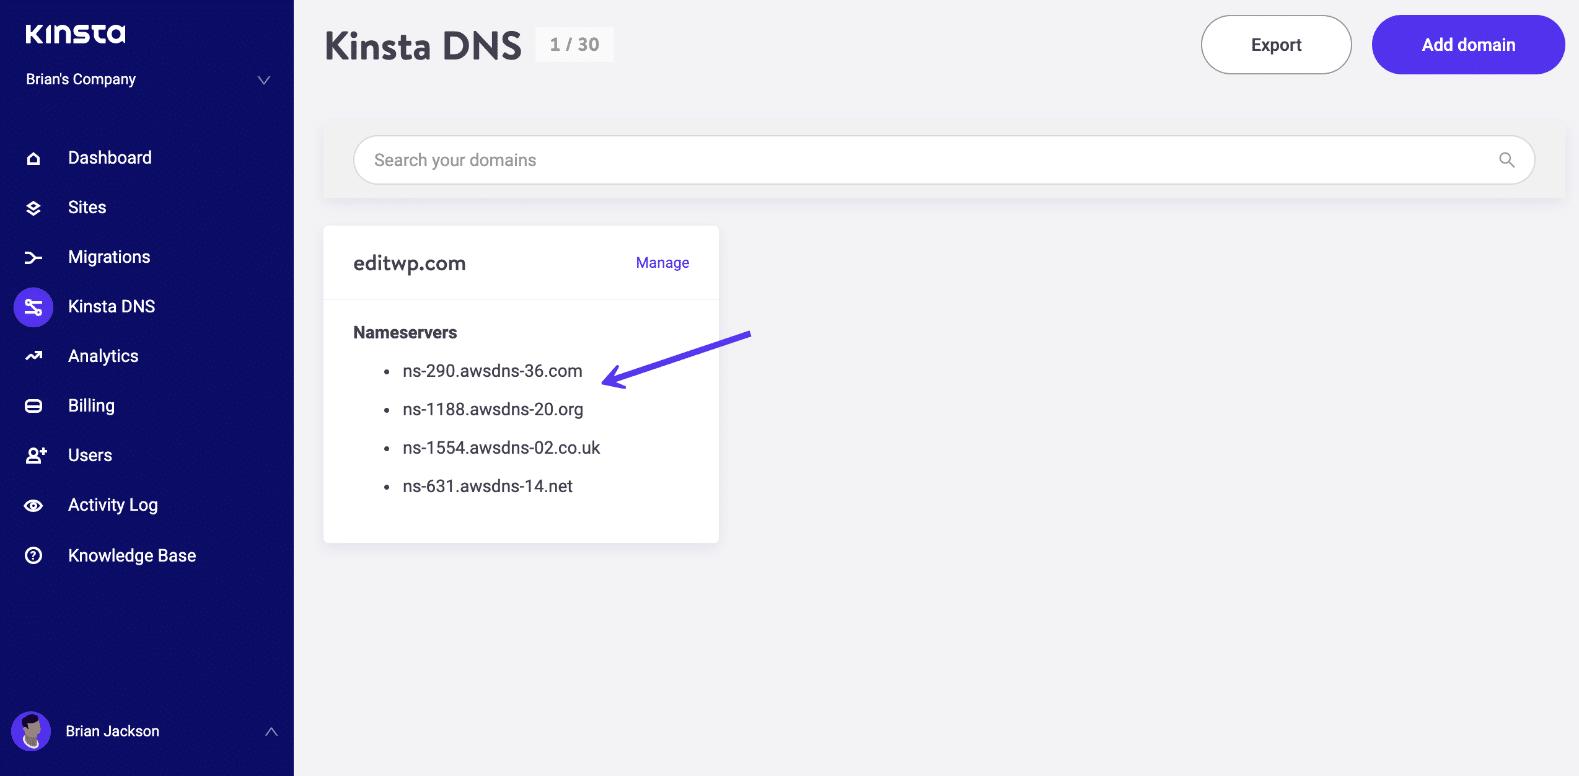 Kinsta DNSネームサーバーを表示する